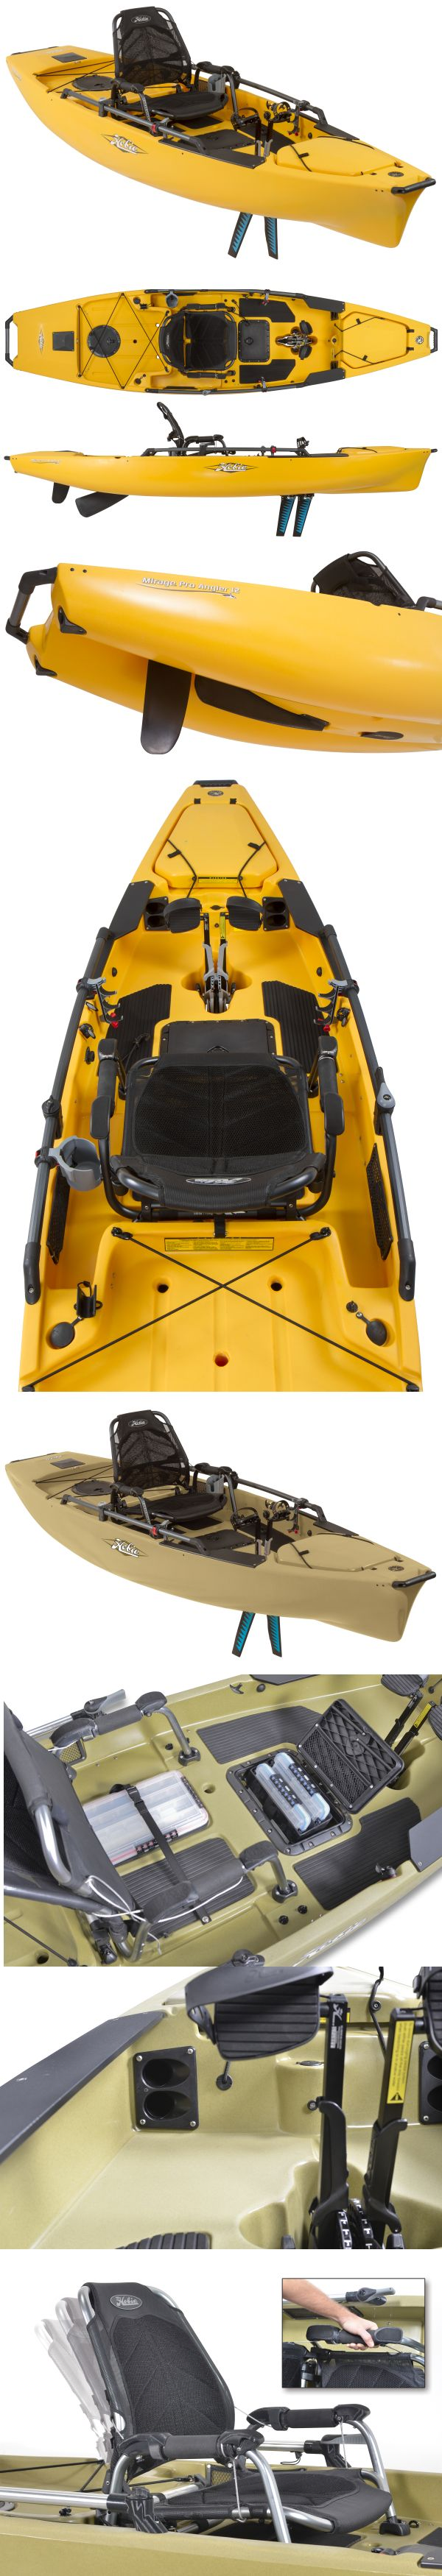 Reviews of the Hobie Pro Angler 12 Fishing Kayak